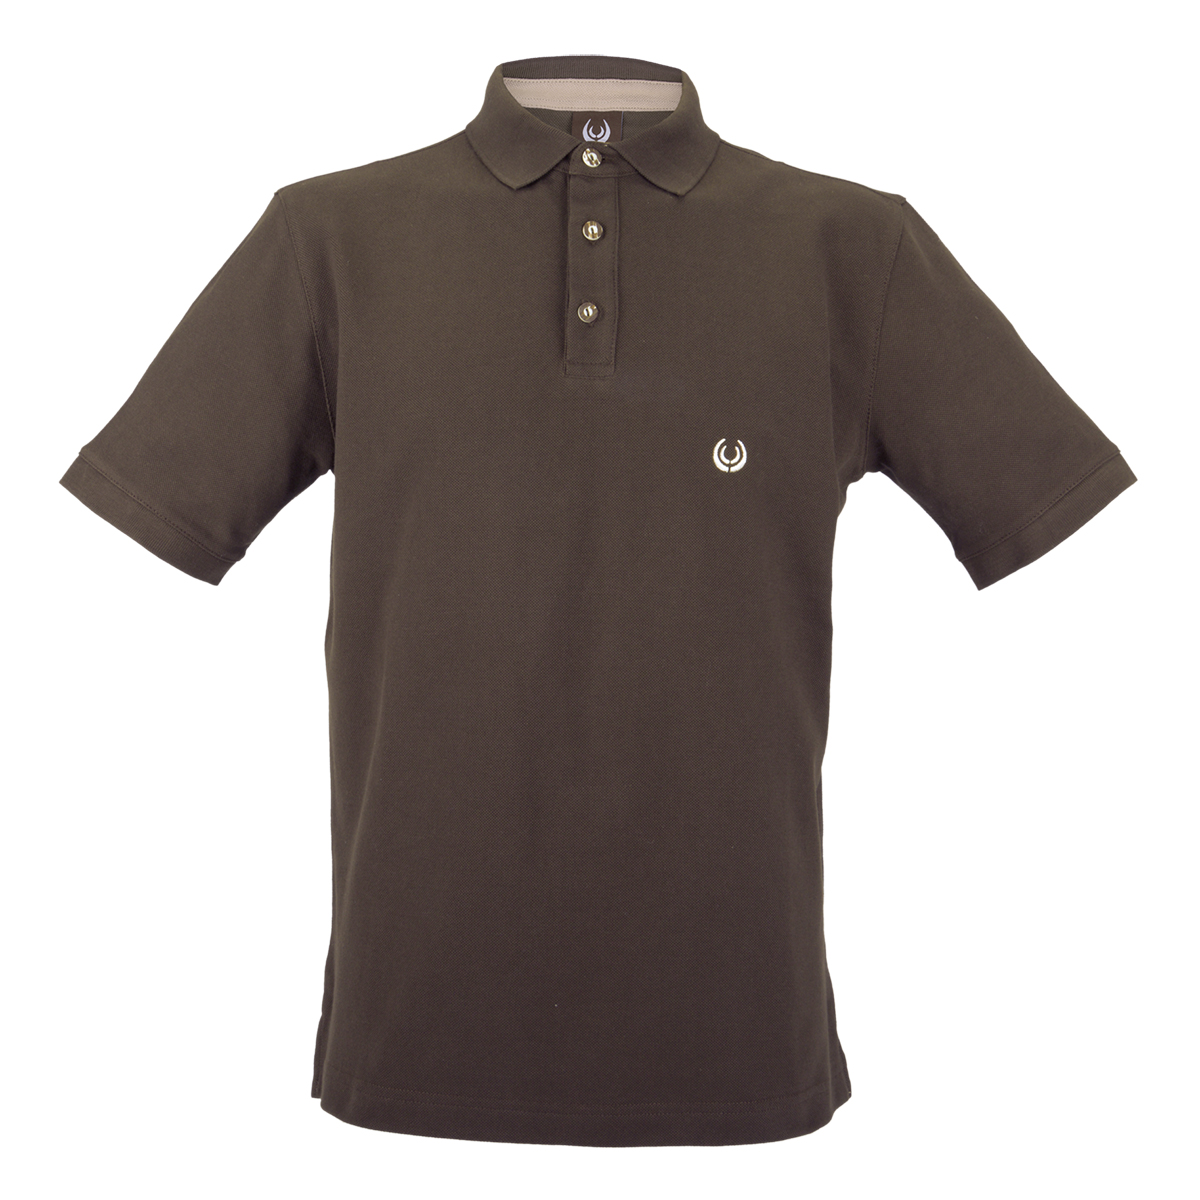 KEYLER Poloshirt Herren Dunkelbraun im Keylershop